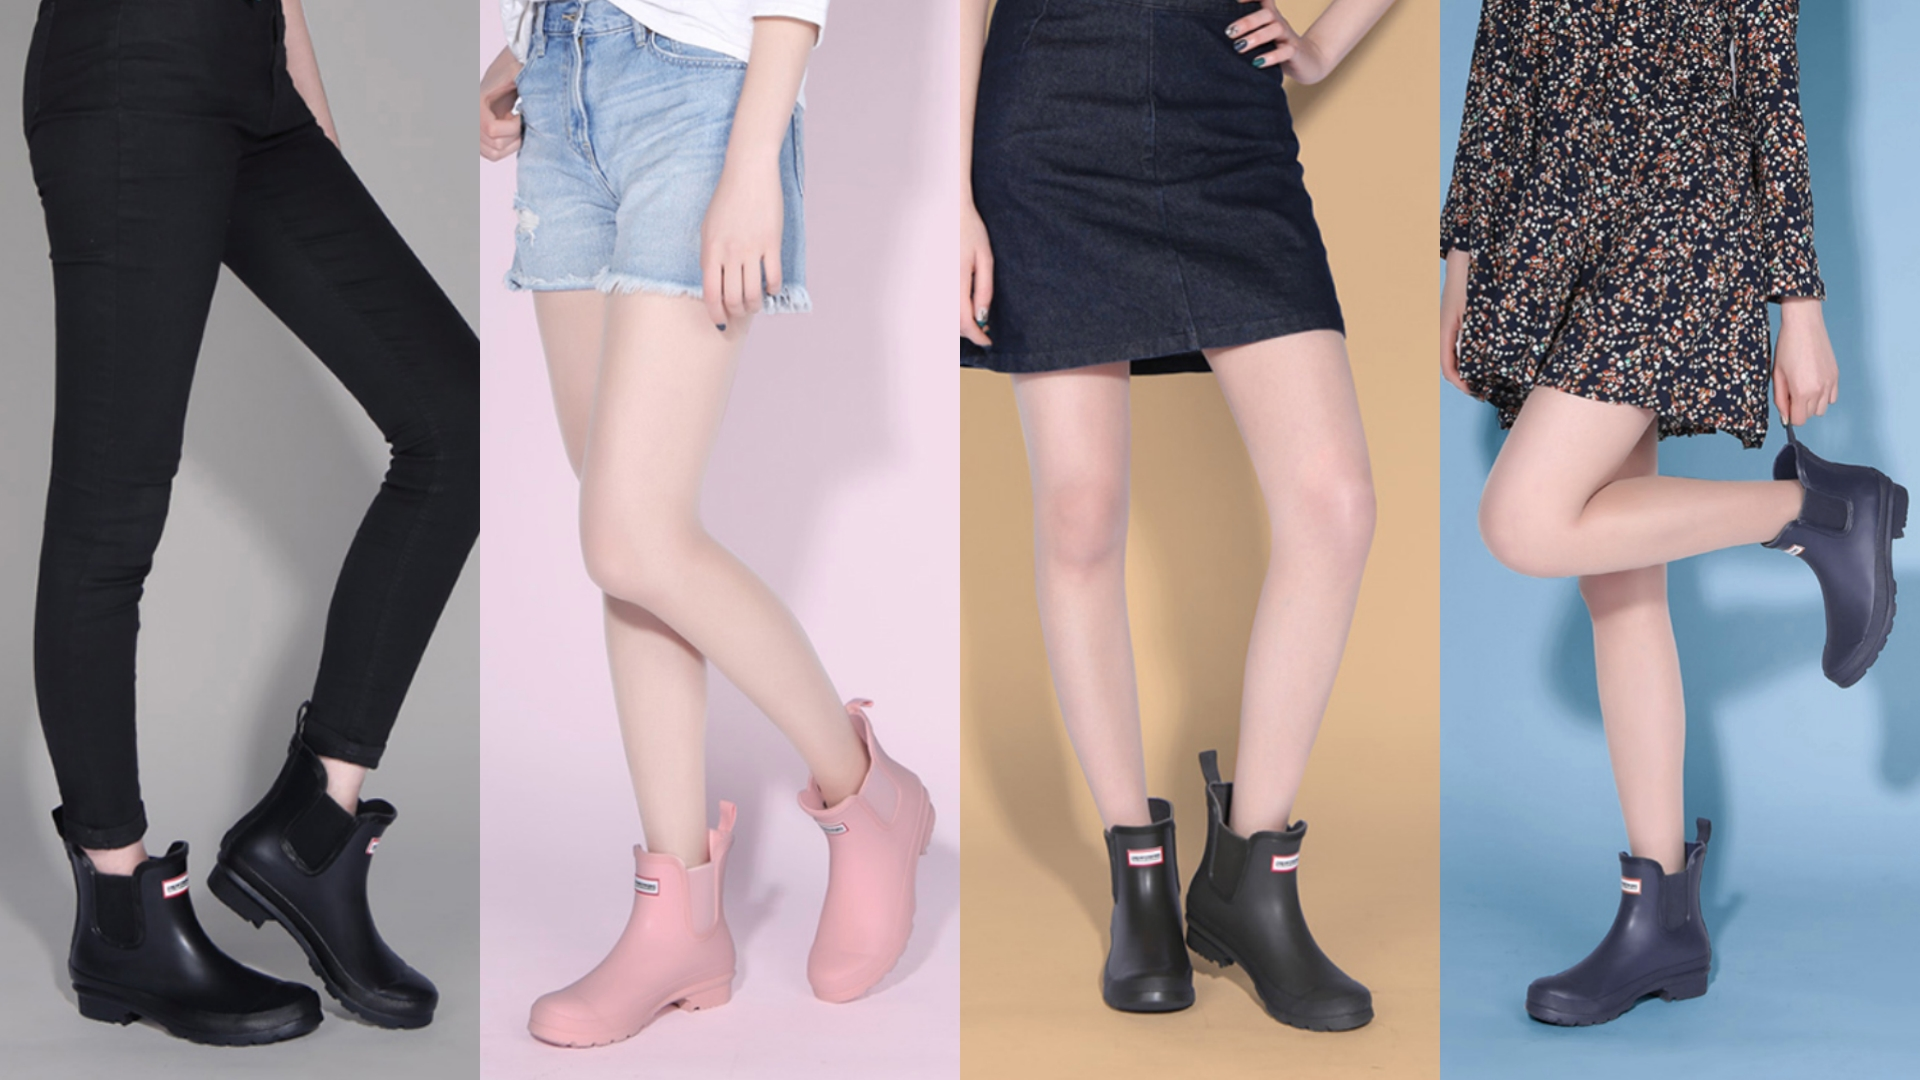 PAPERPLANES 紙飛機 韓國空運 雨鞋 優質軟面橡膠 舒適好穿 短筒 雨靴